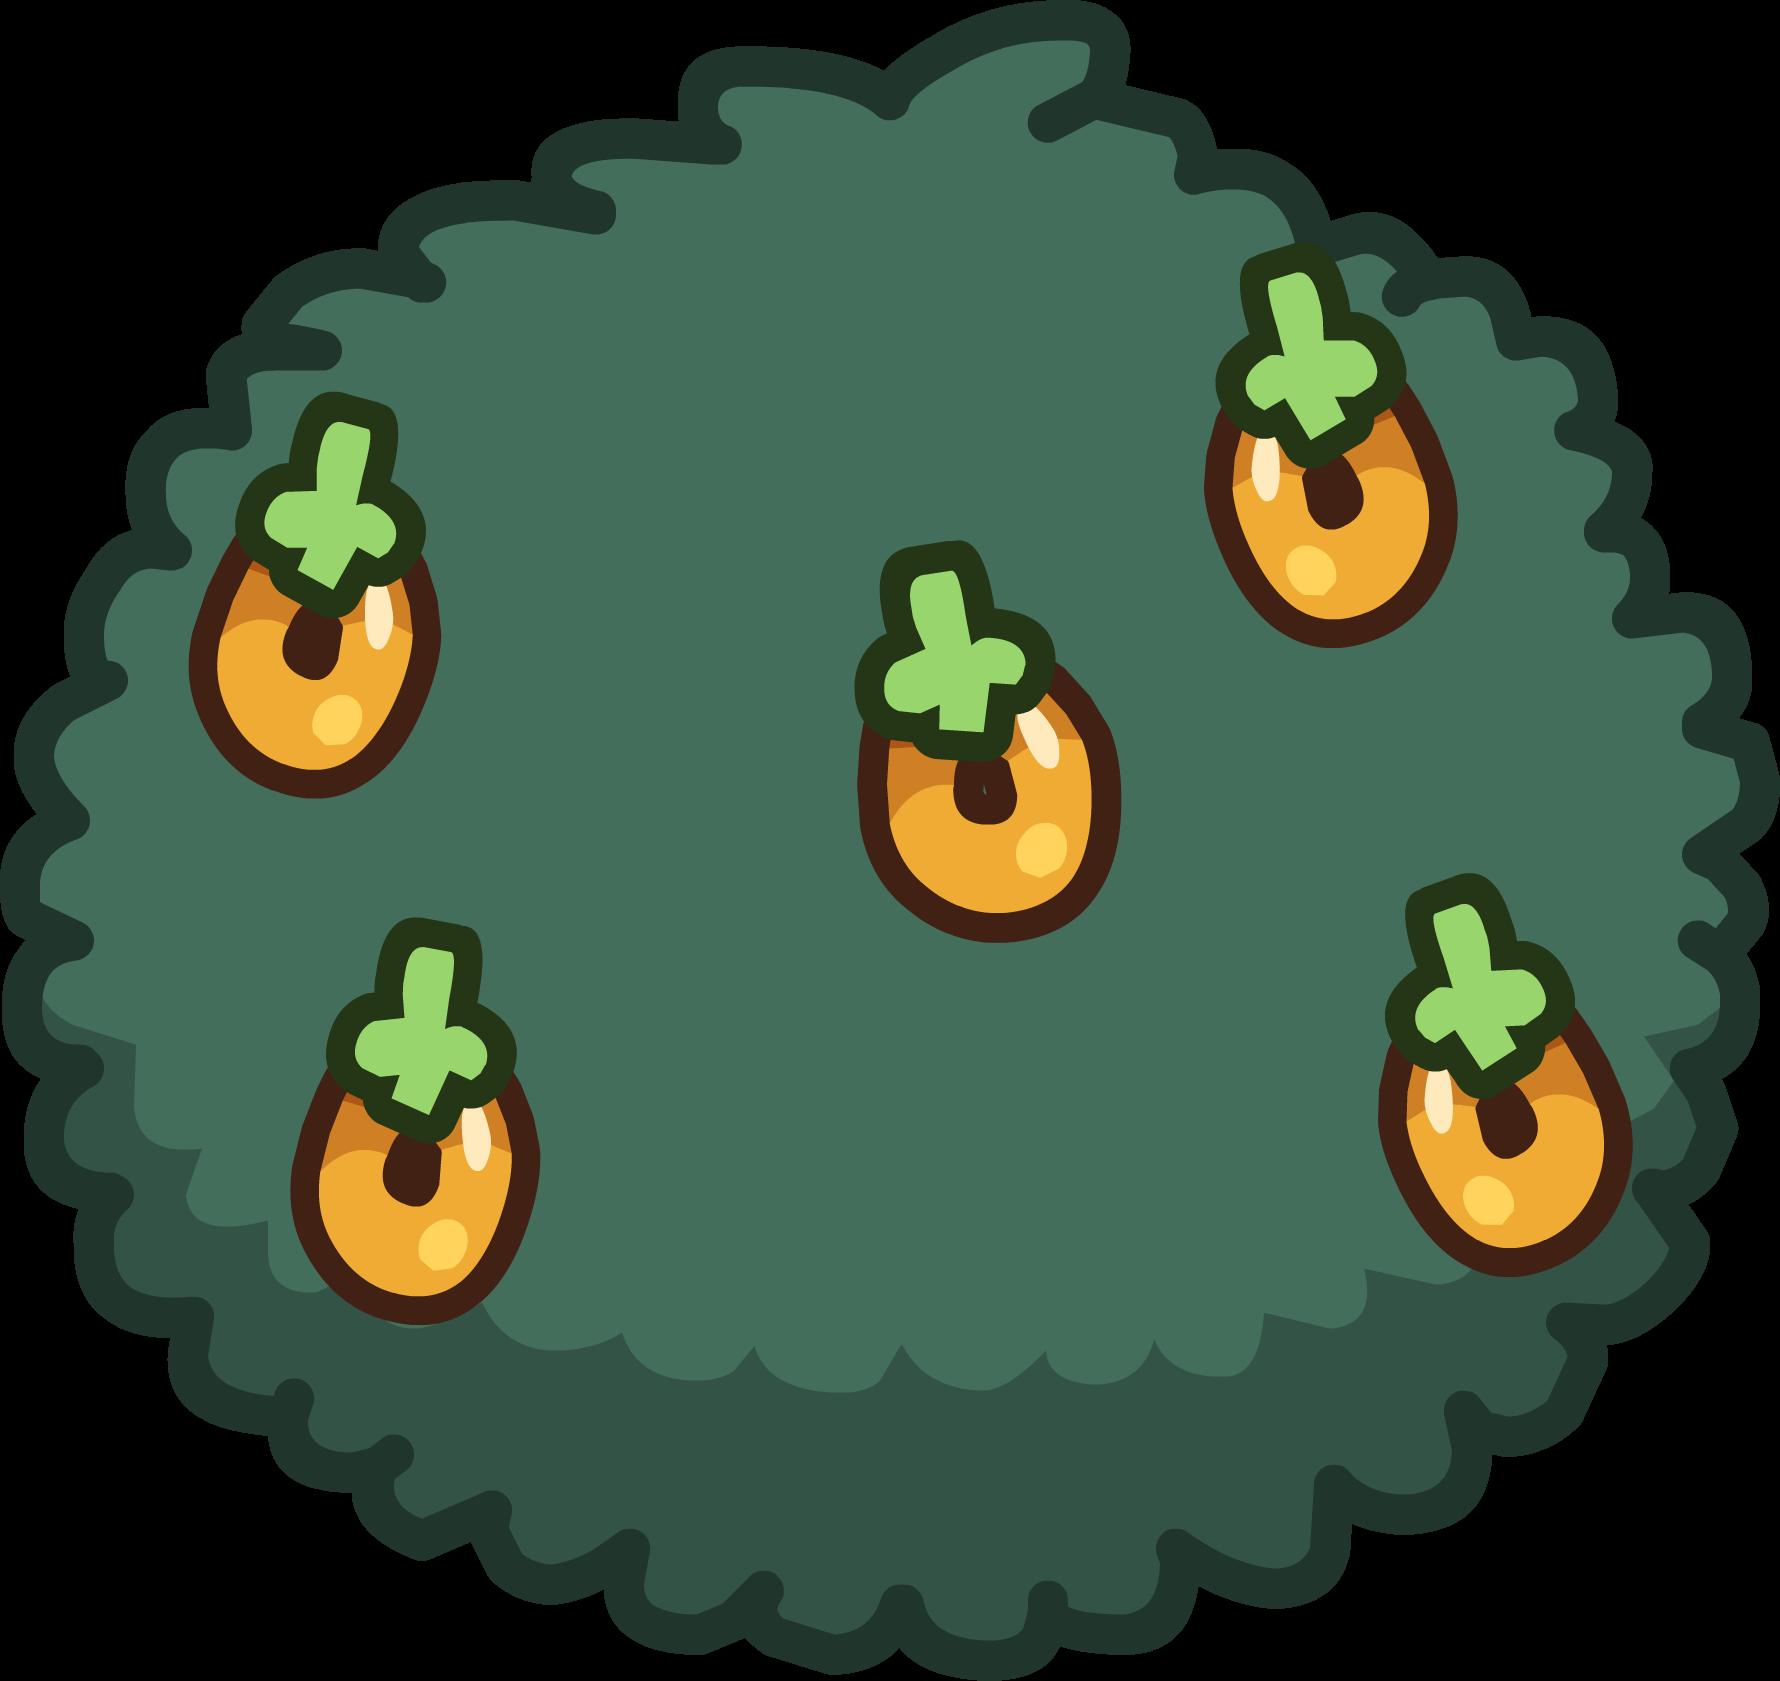 Arbusto de Puffitos Variados